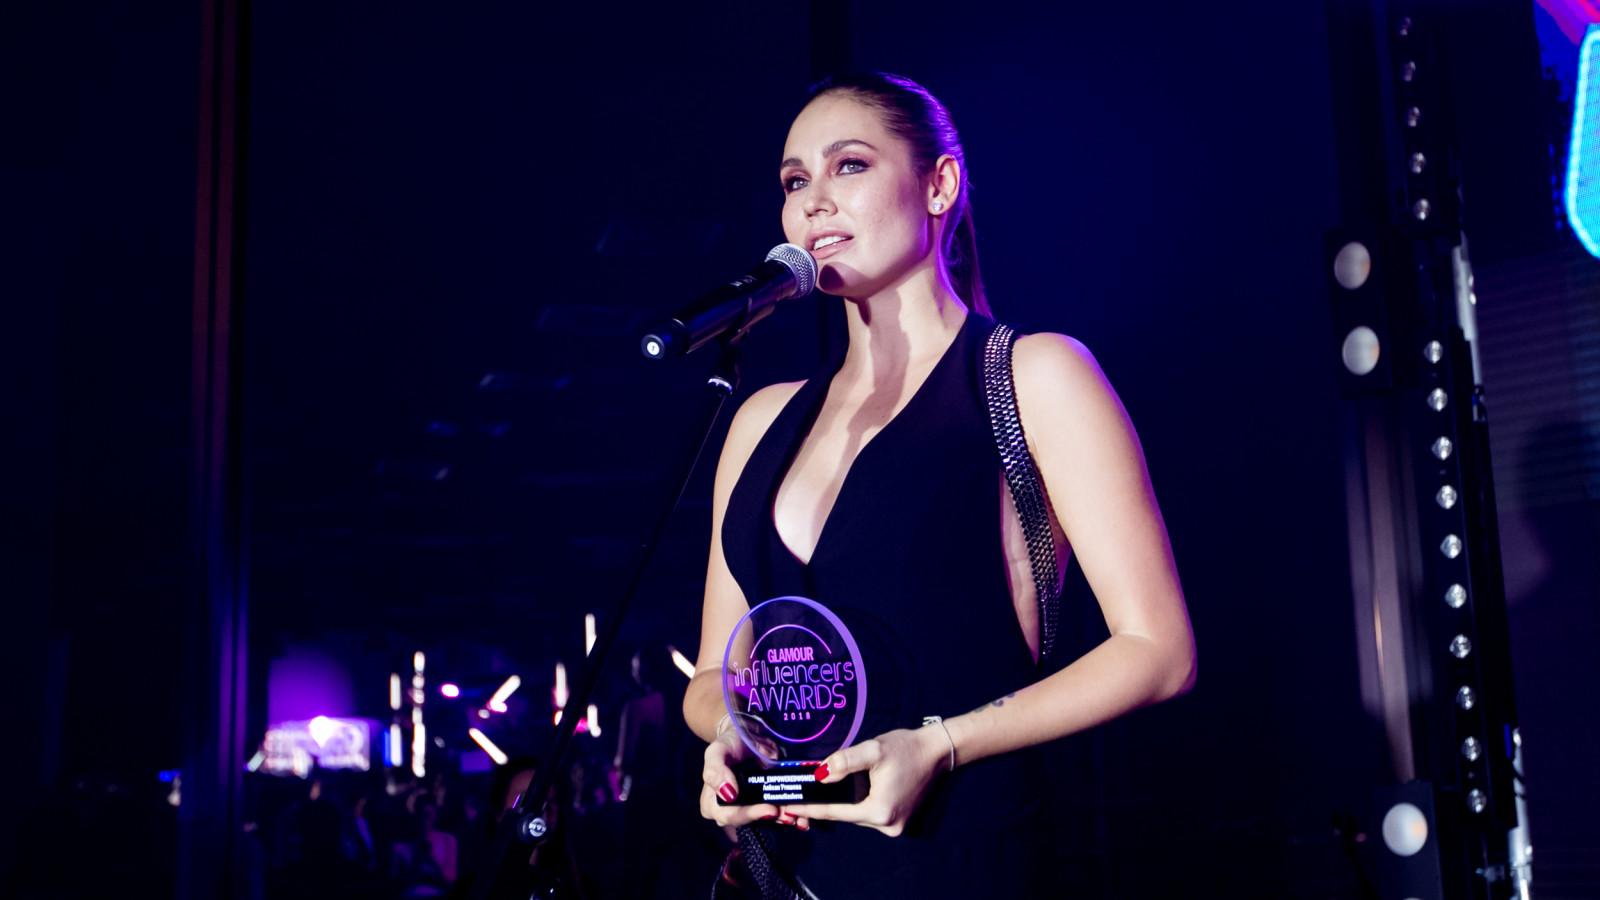 M56A9513 - Maria Pertseva-Khvaley - Russia - Glamour Influencers Awards